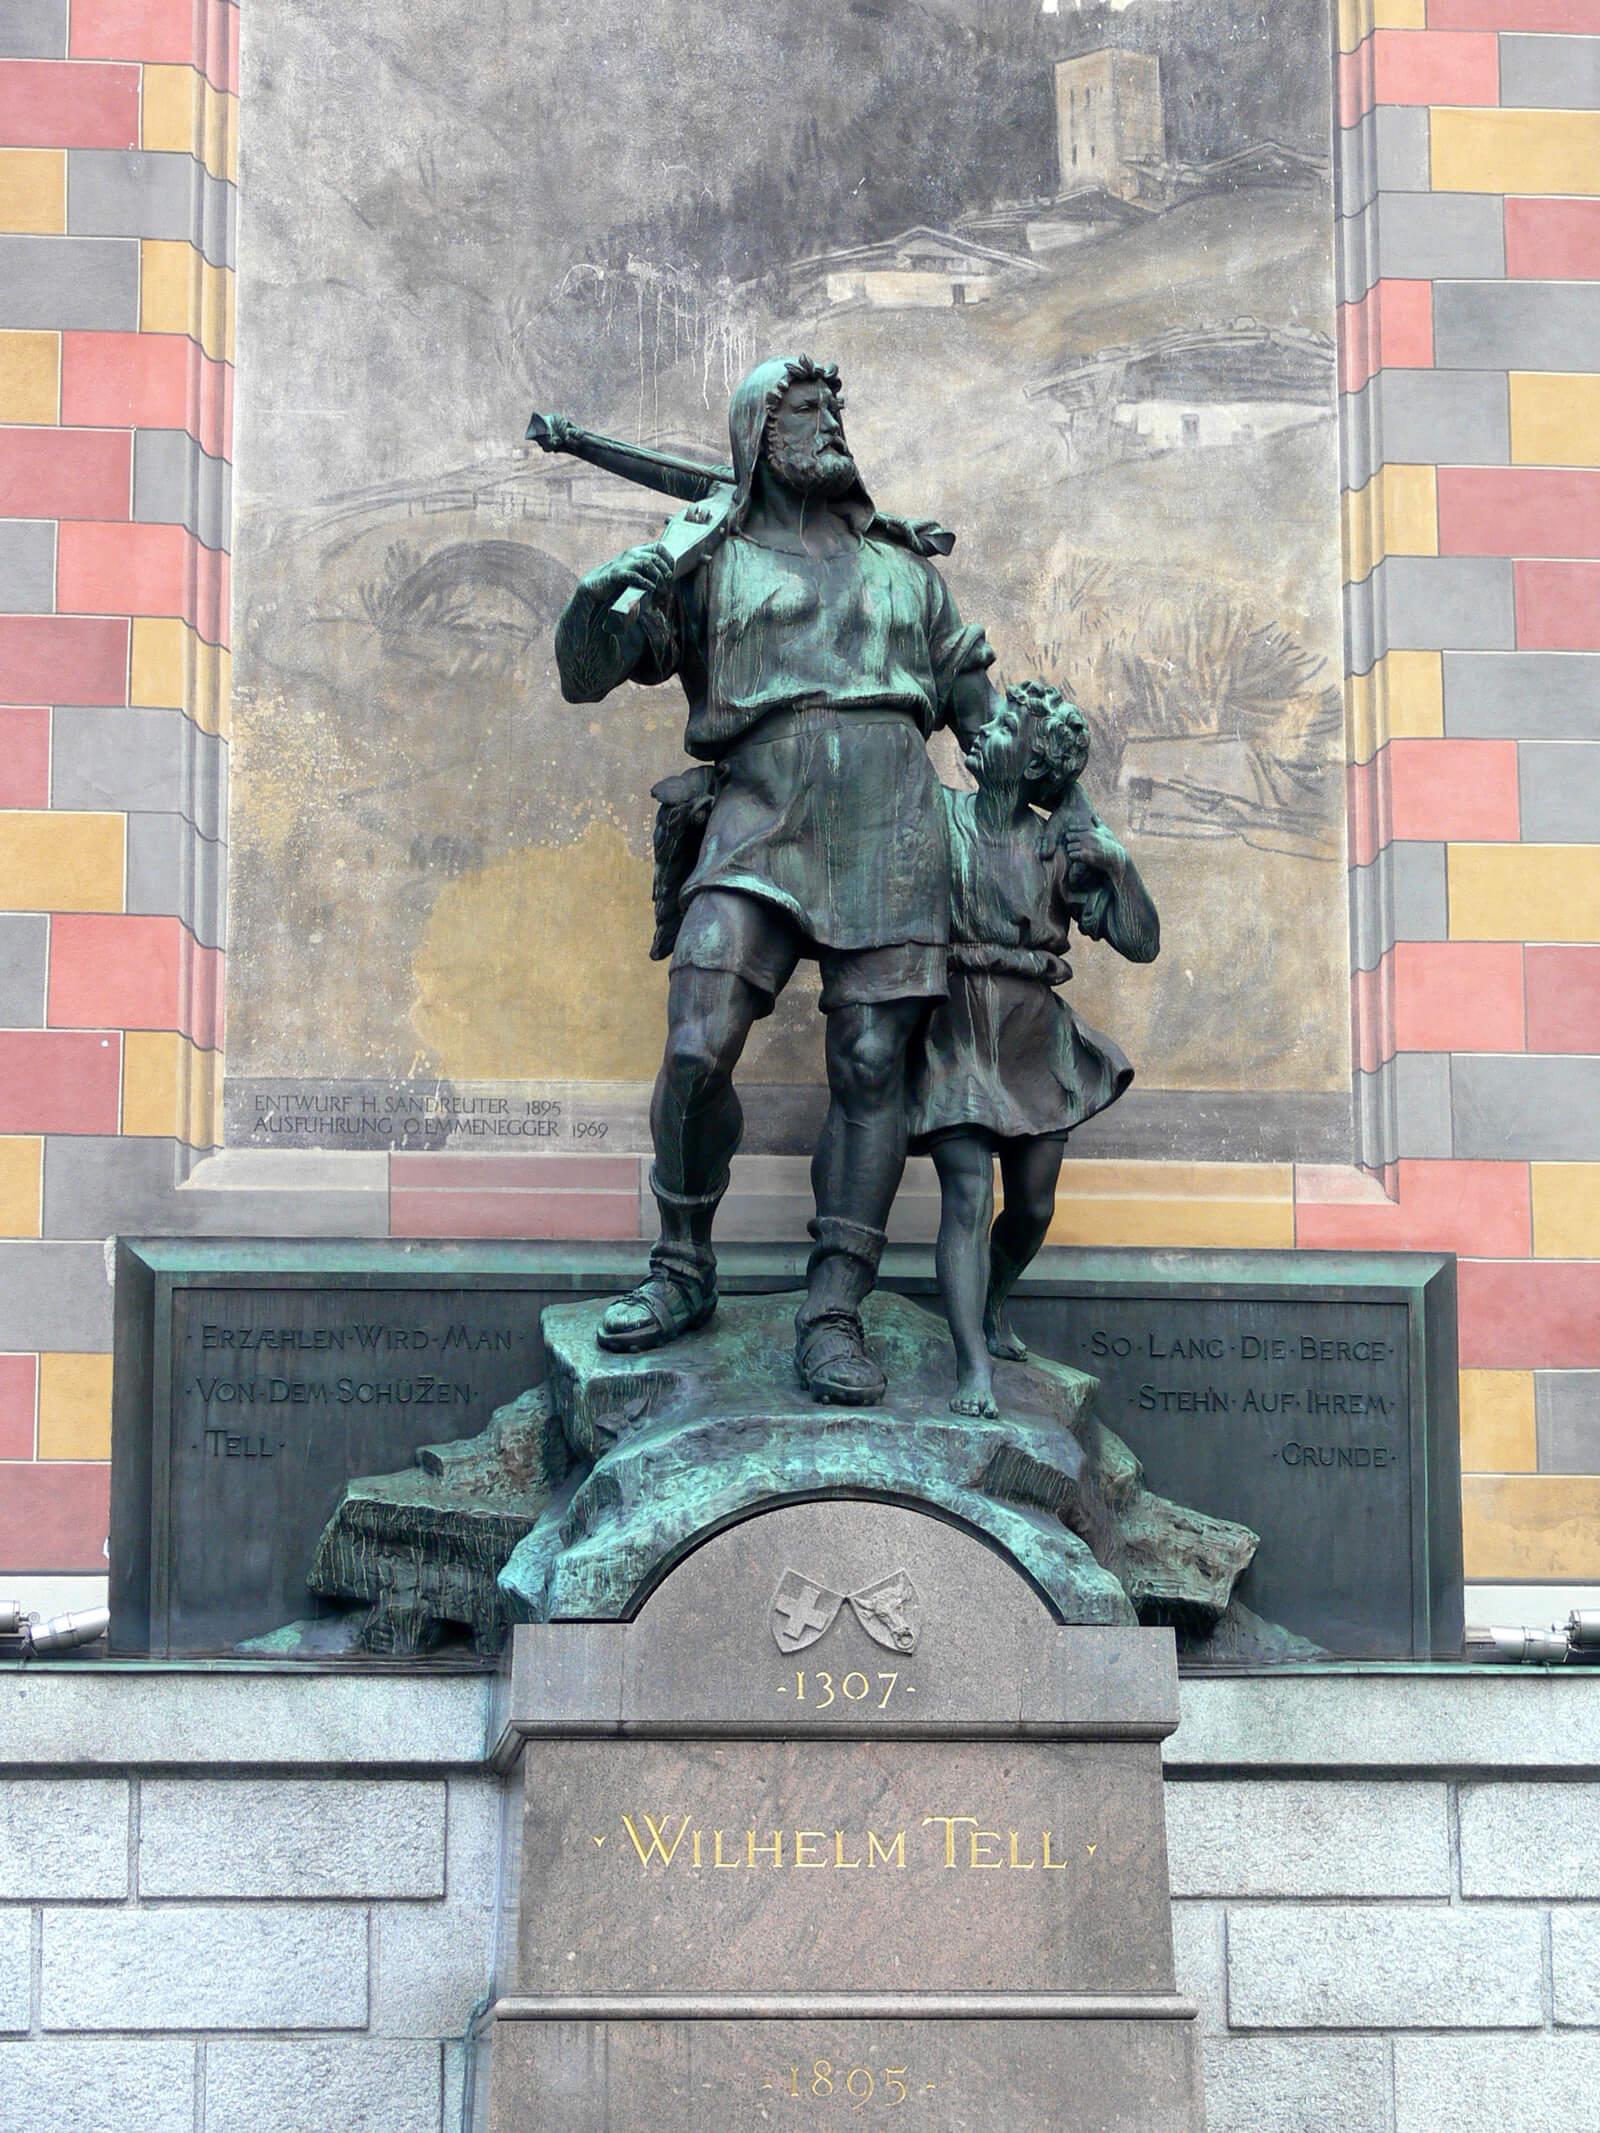 William Tell Statue in Altdorf, Switzerland